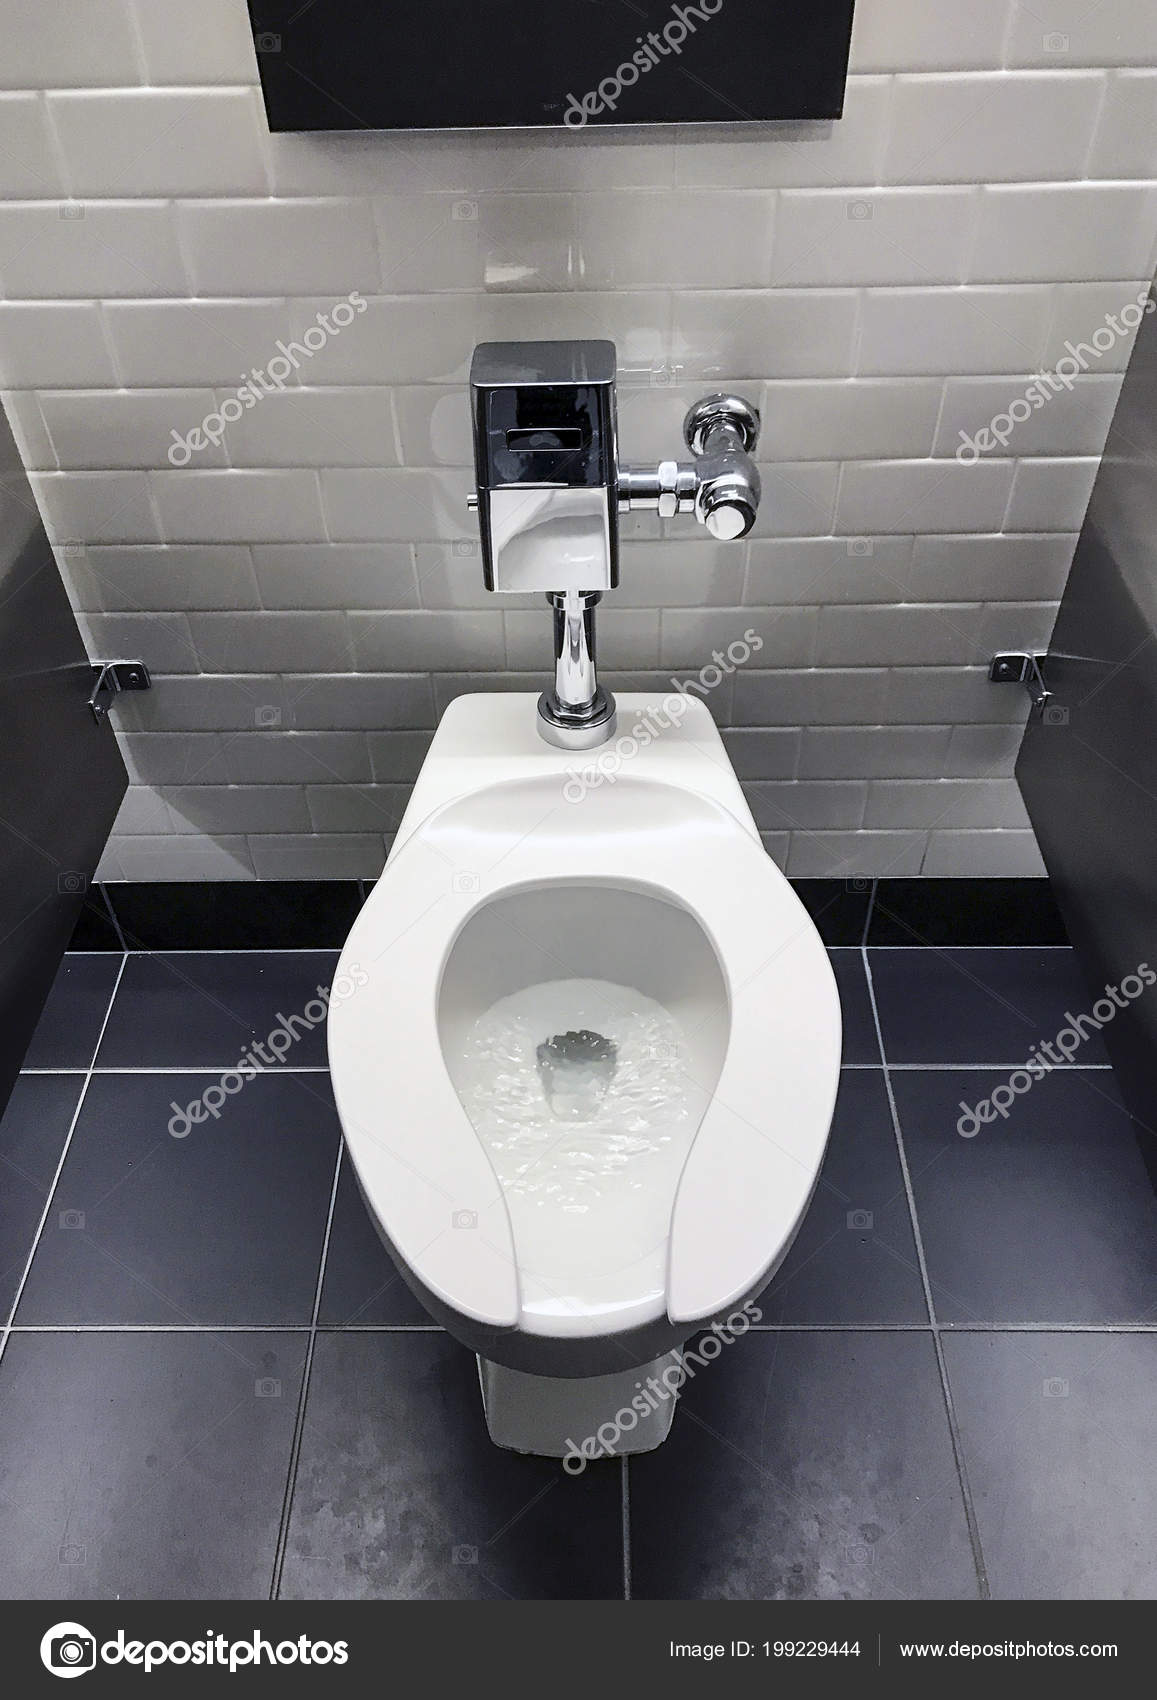 carrelage mural toilette interesting armoire salle de bain leroy merlin armoires de toilettes. Black Bedroom Furniture Sets. Home Design Ideas